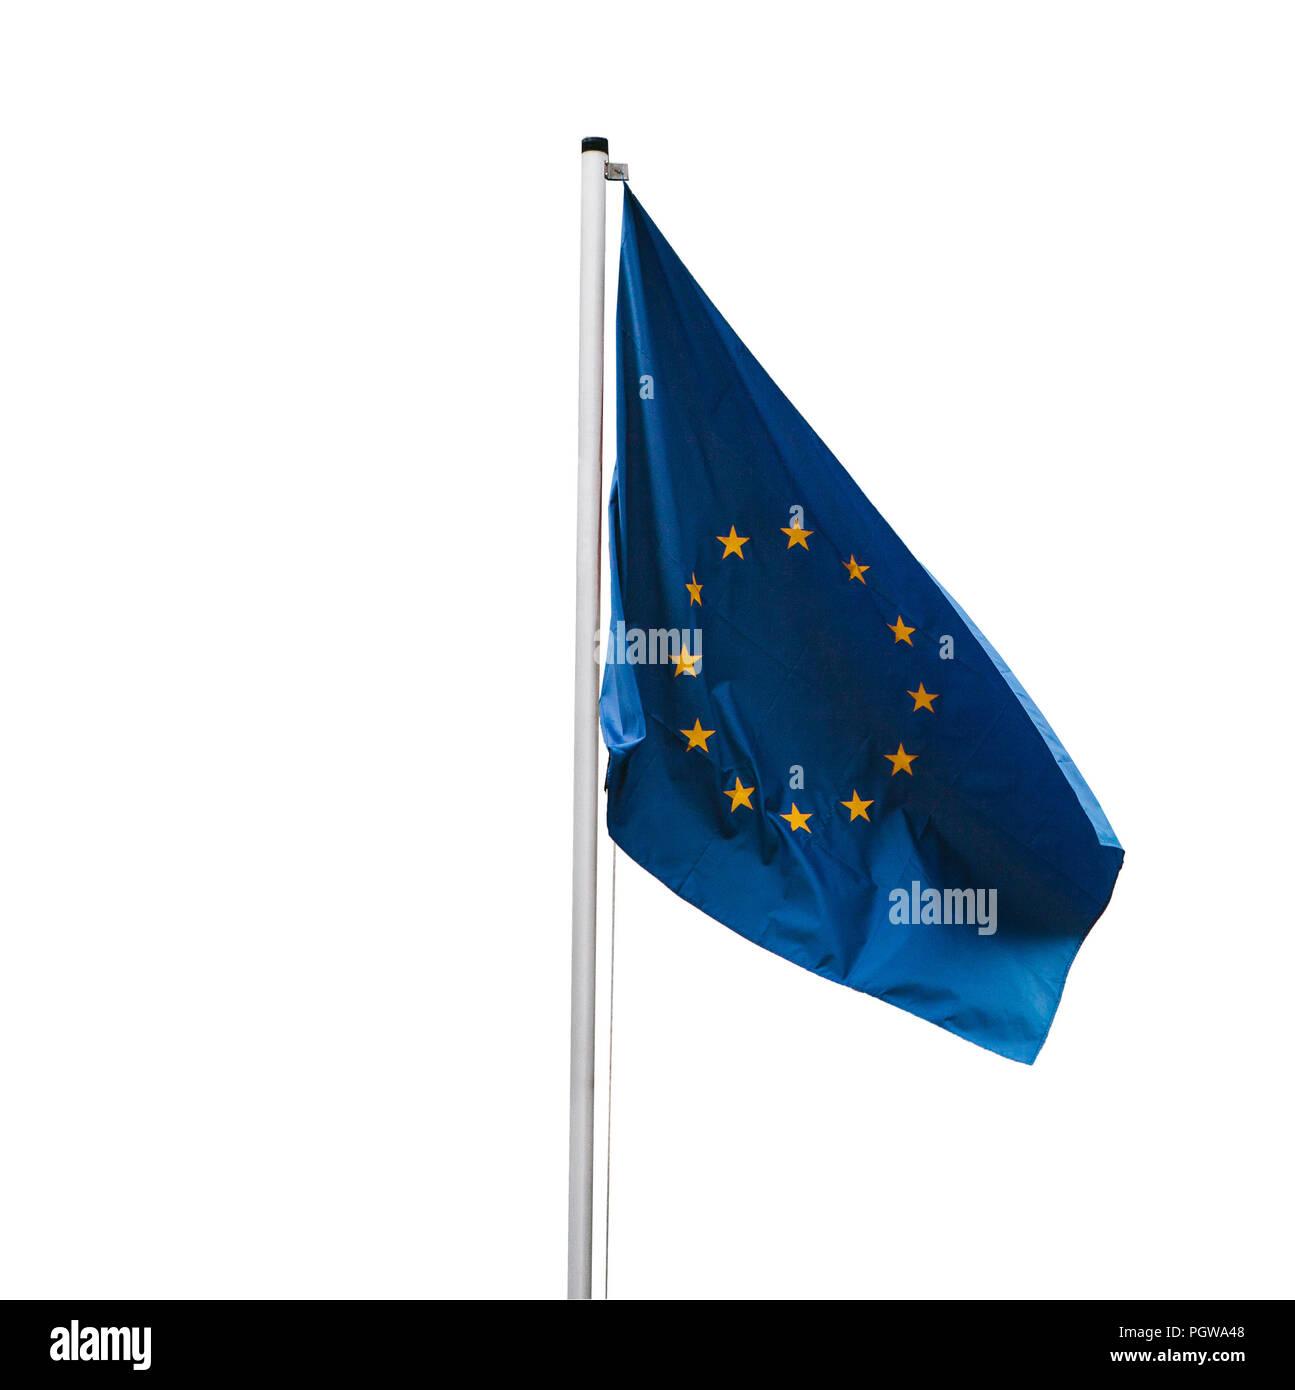 Flag of the European Union on a flagpole isolated on white background. - Stock Image